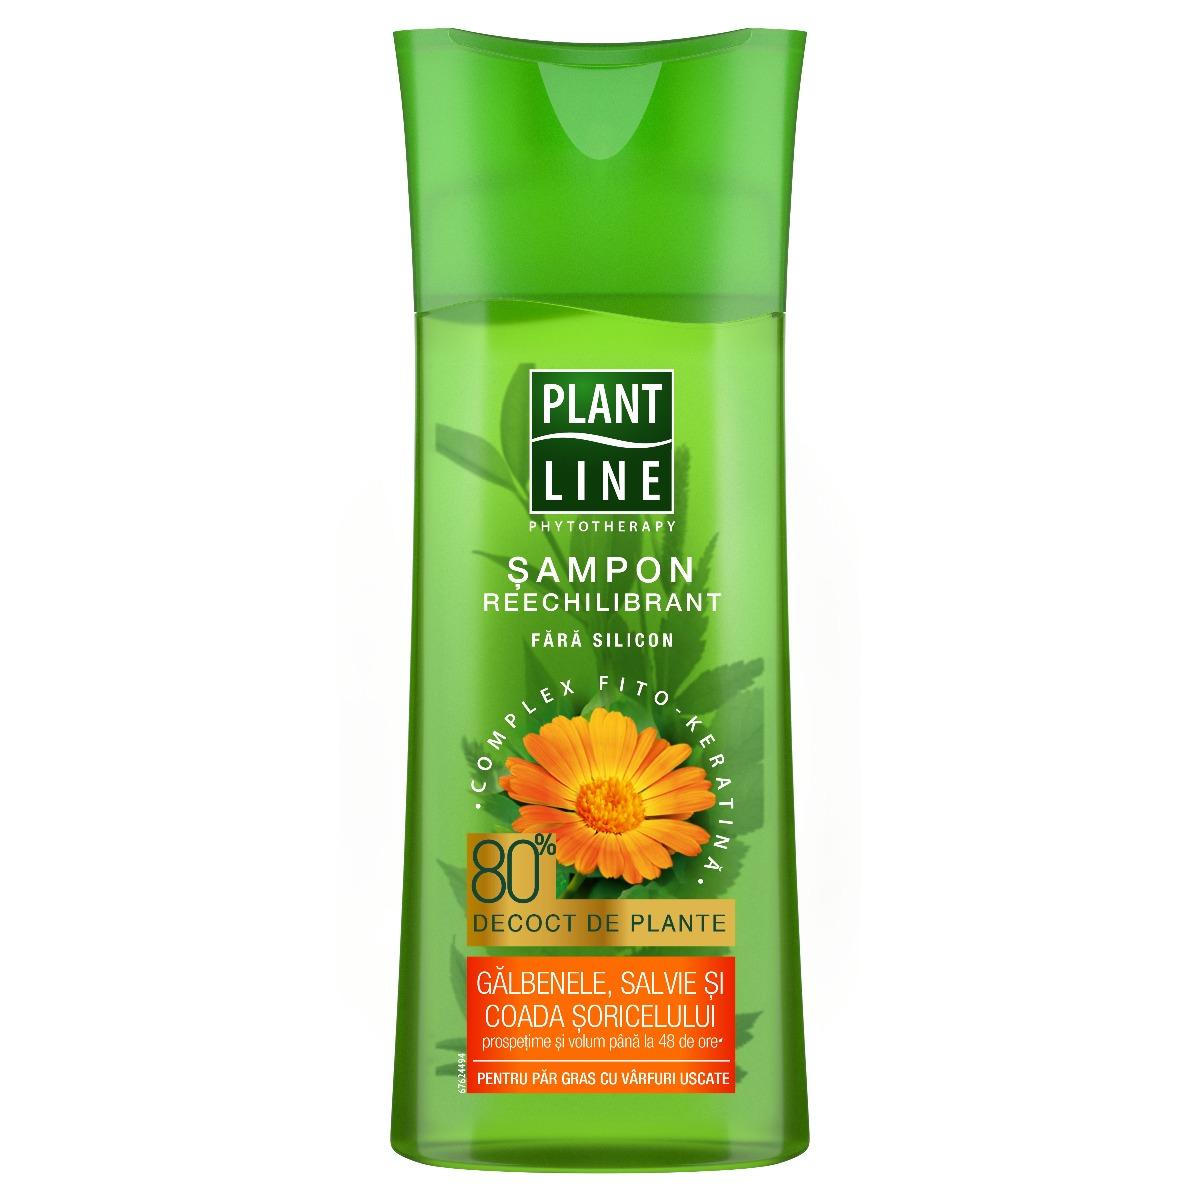 Sampon cu extract de galbenele Plant Line, 250 ml